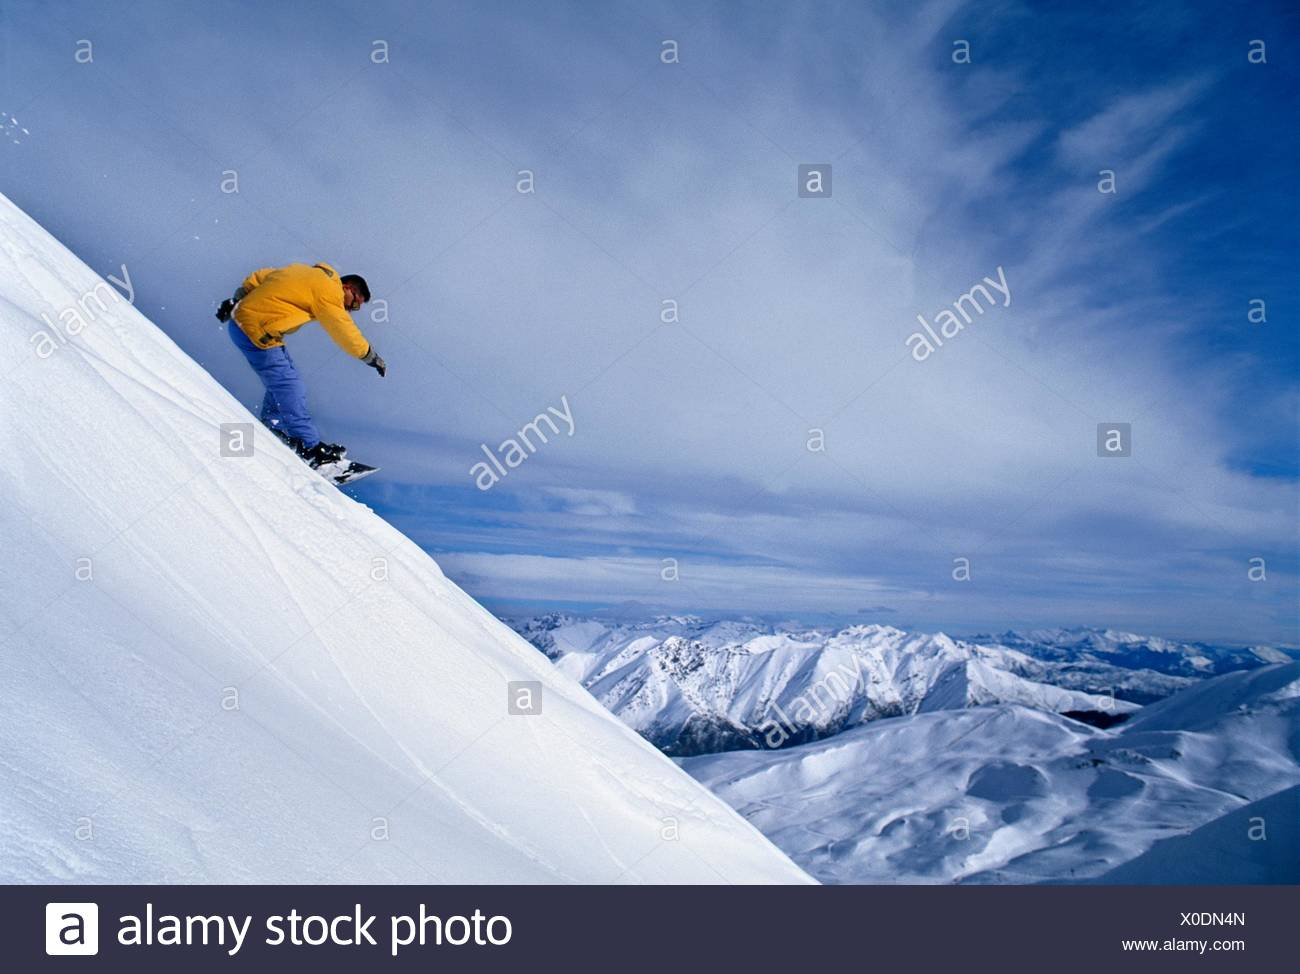 Snow board  Boi Taull ski resort. Alta Ribagorça, Lleida province, Catalonia, Spain - Stock Image